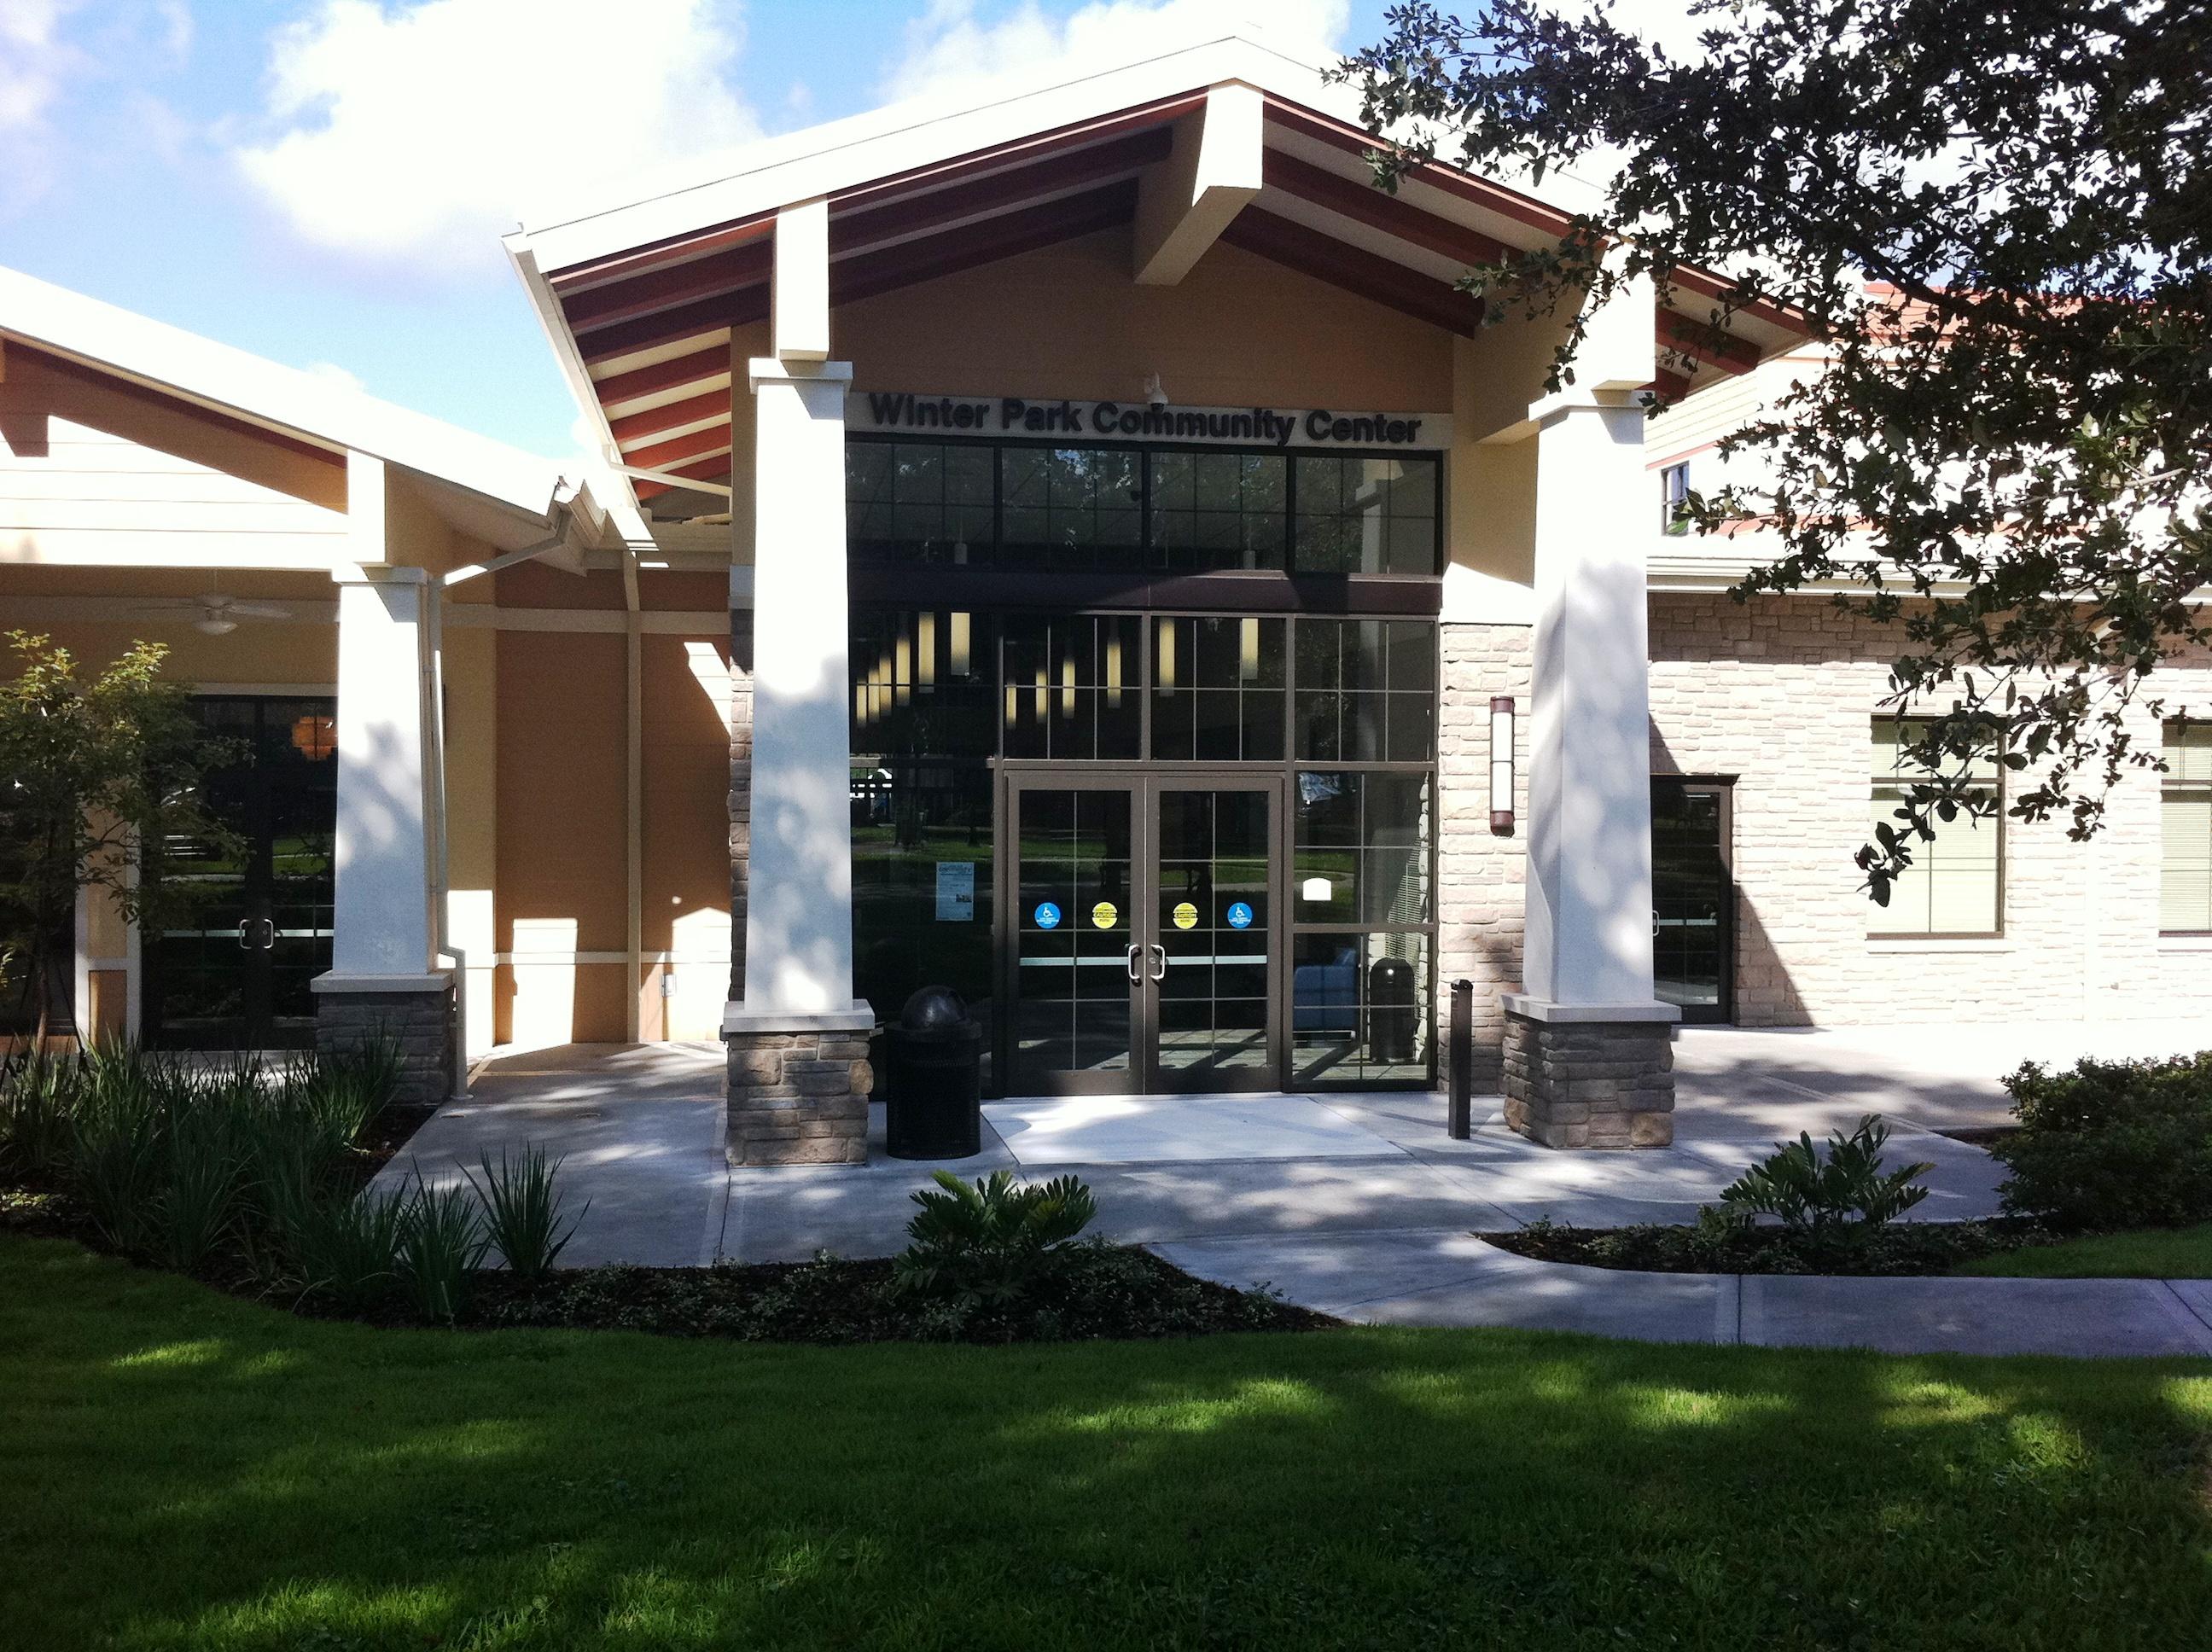 The New Winter Park Community Center